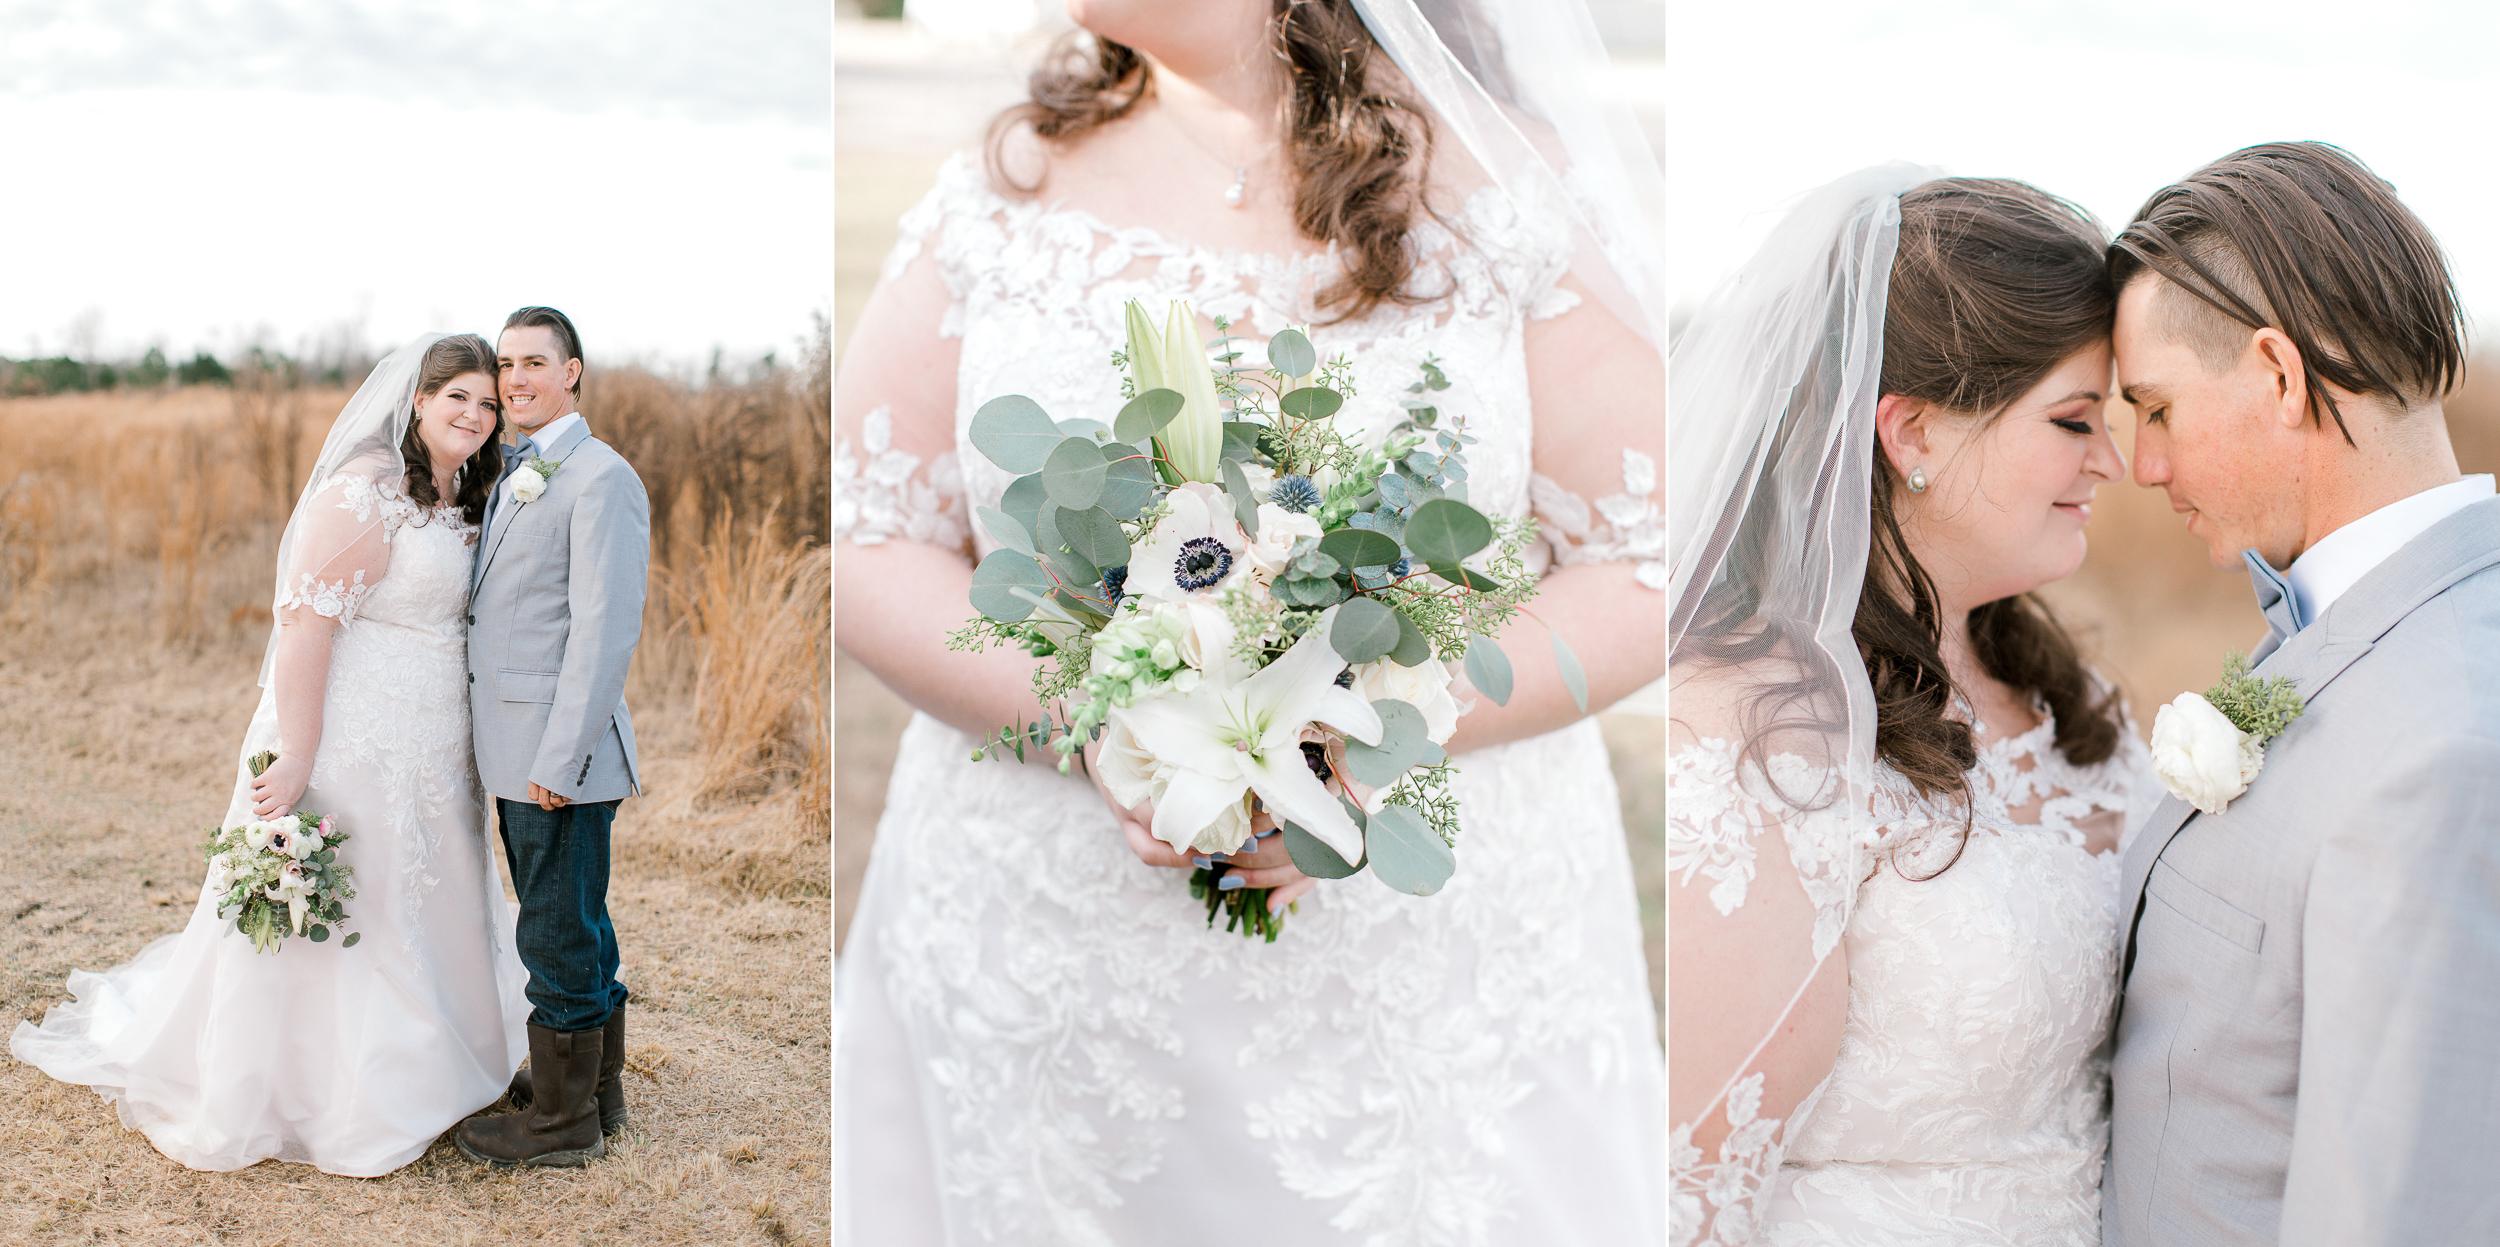 Jessica + Cody | Luckey Stables Wedding